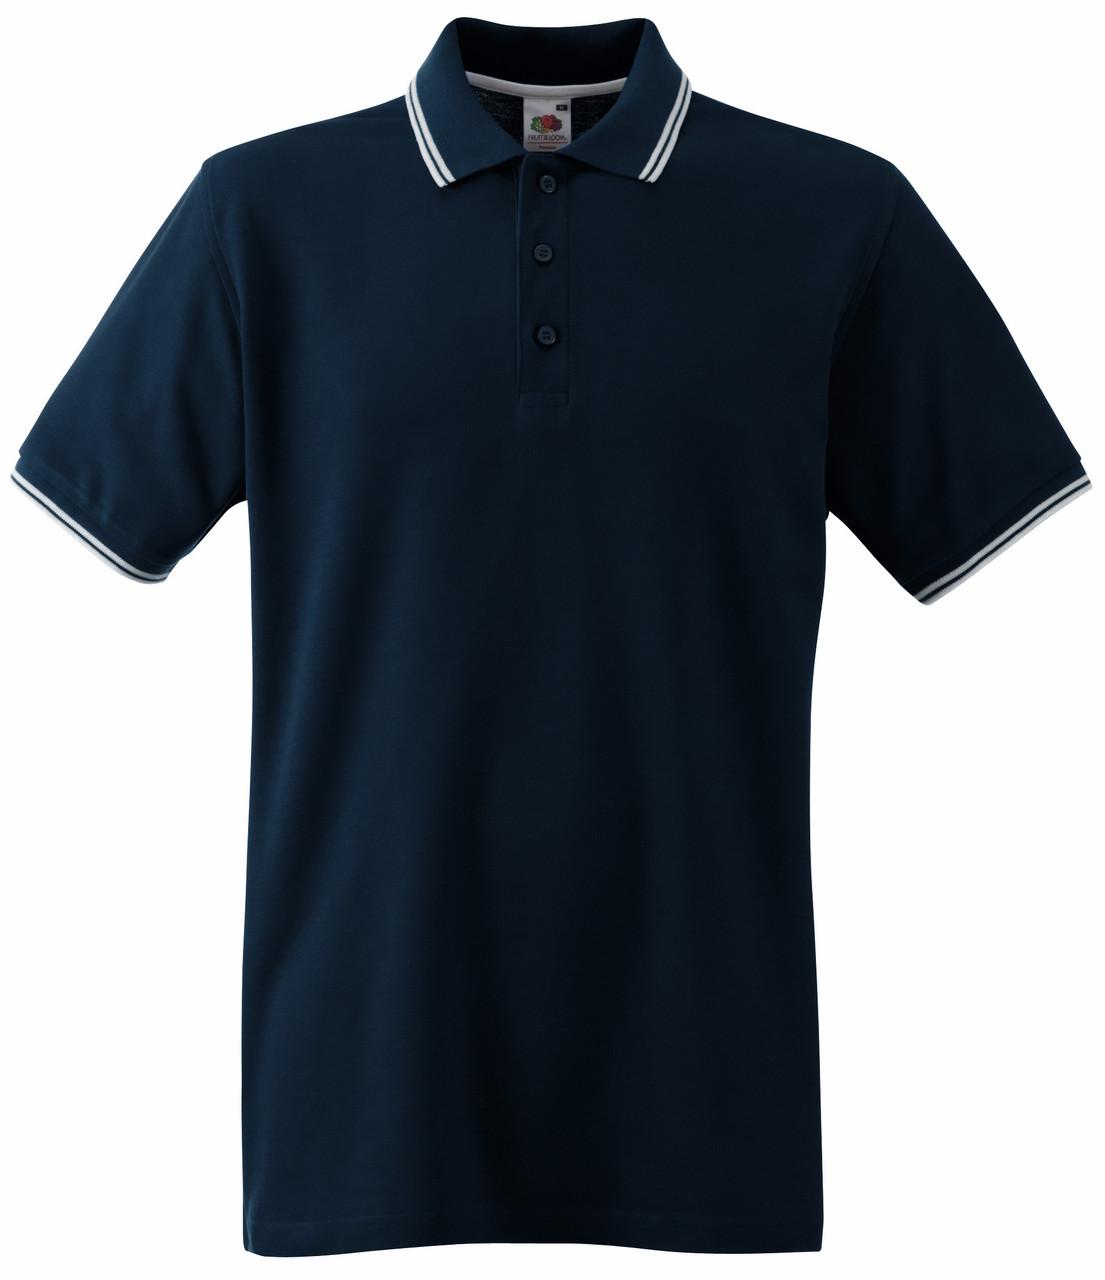 Мужское Поло Глубоко Тёмно-синее с Белыми Полосками Fruit of the loom 63-032-85 S